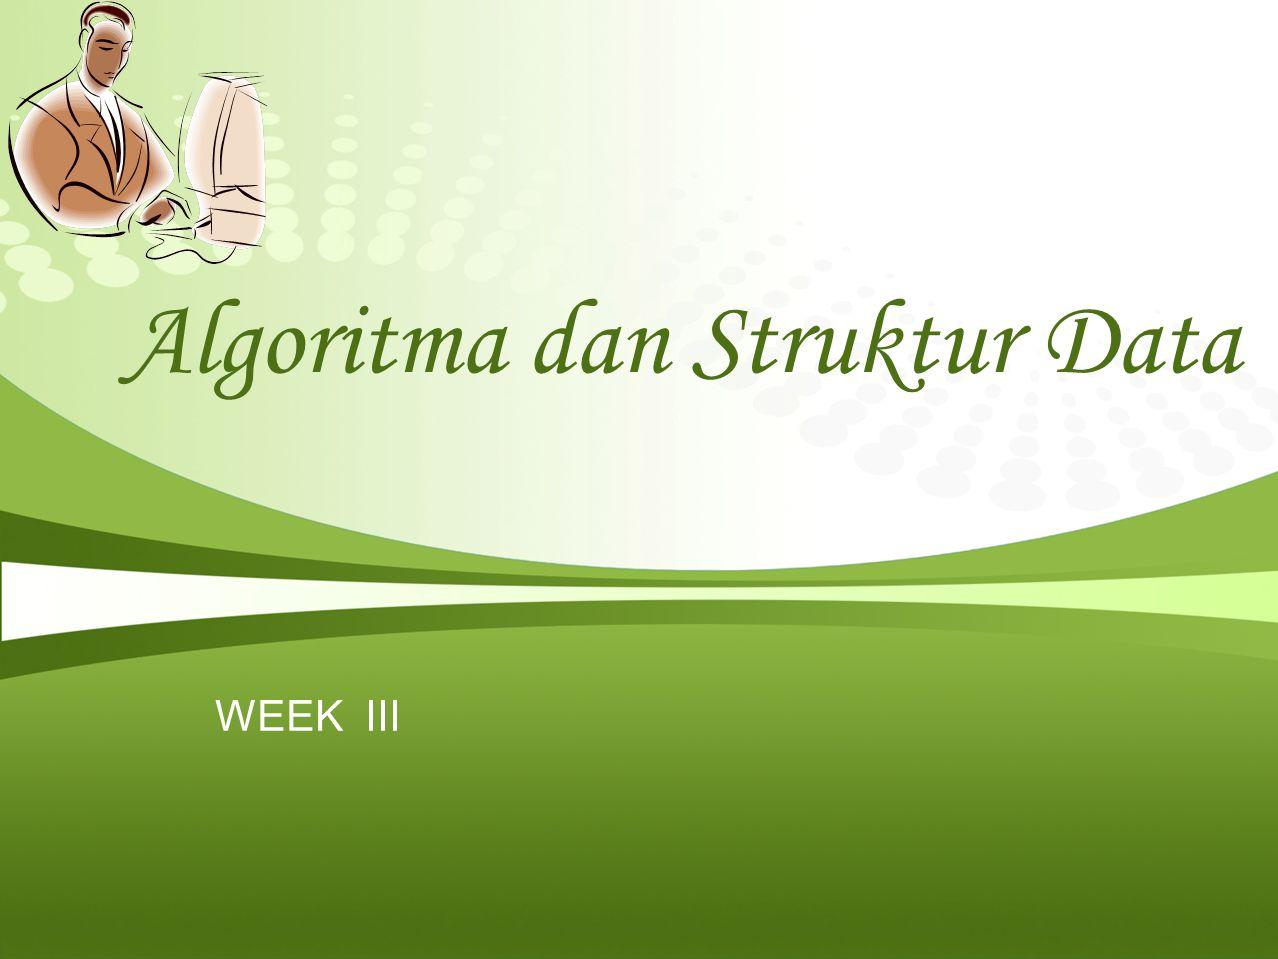 Algoritma dan Struktur Data WEEK III